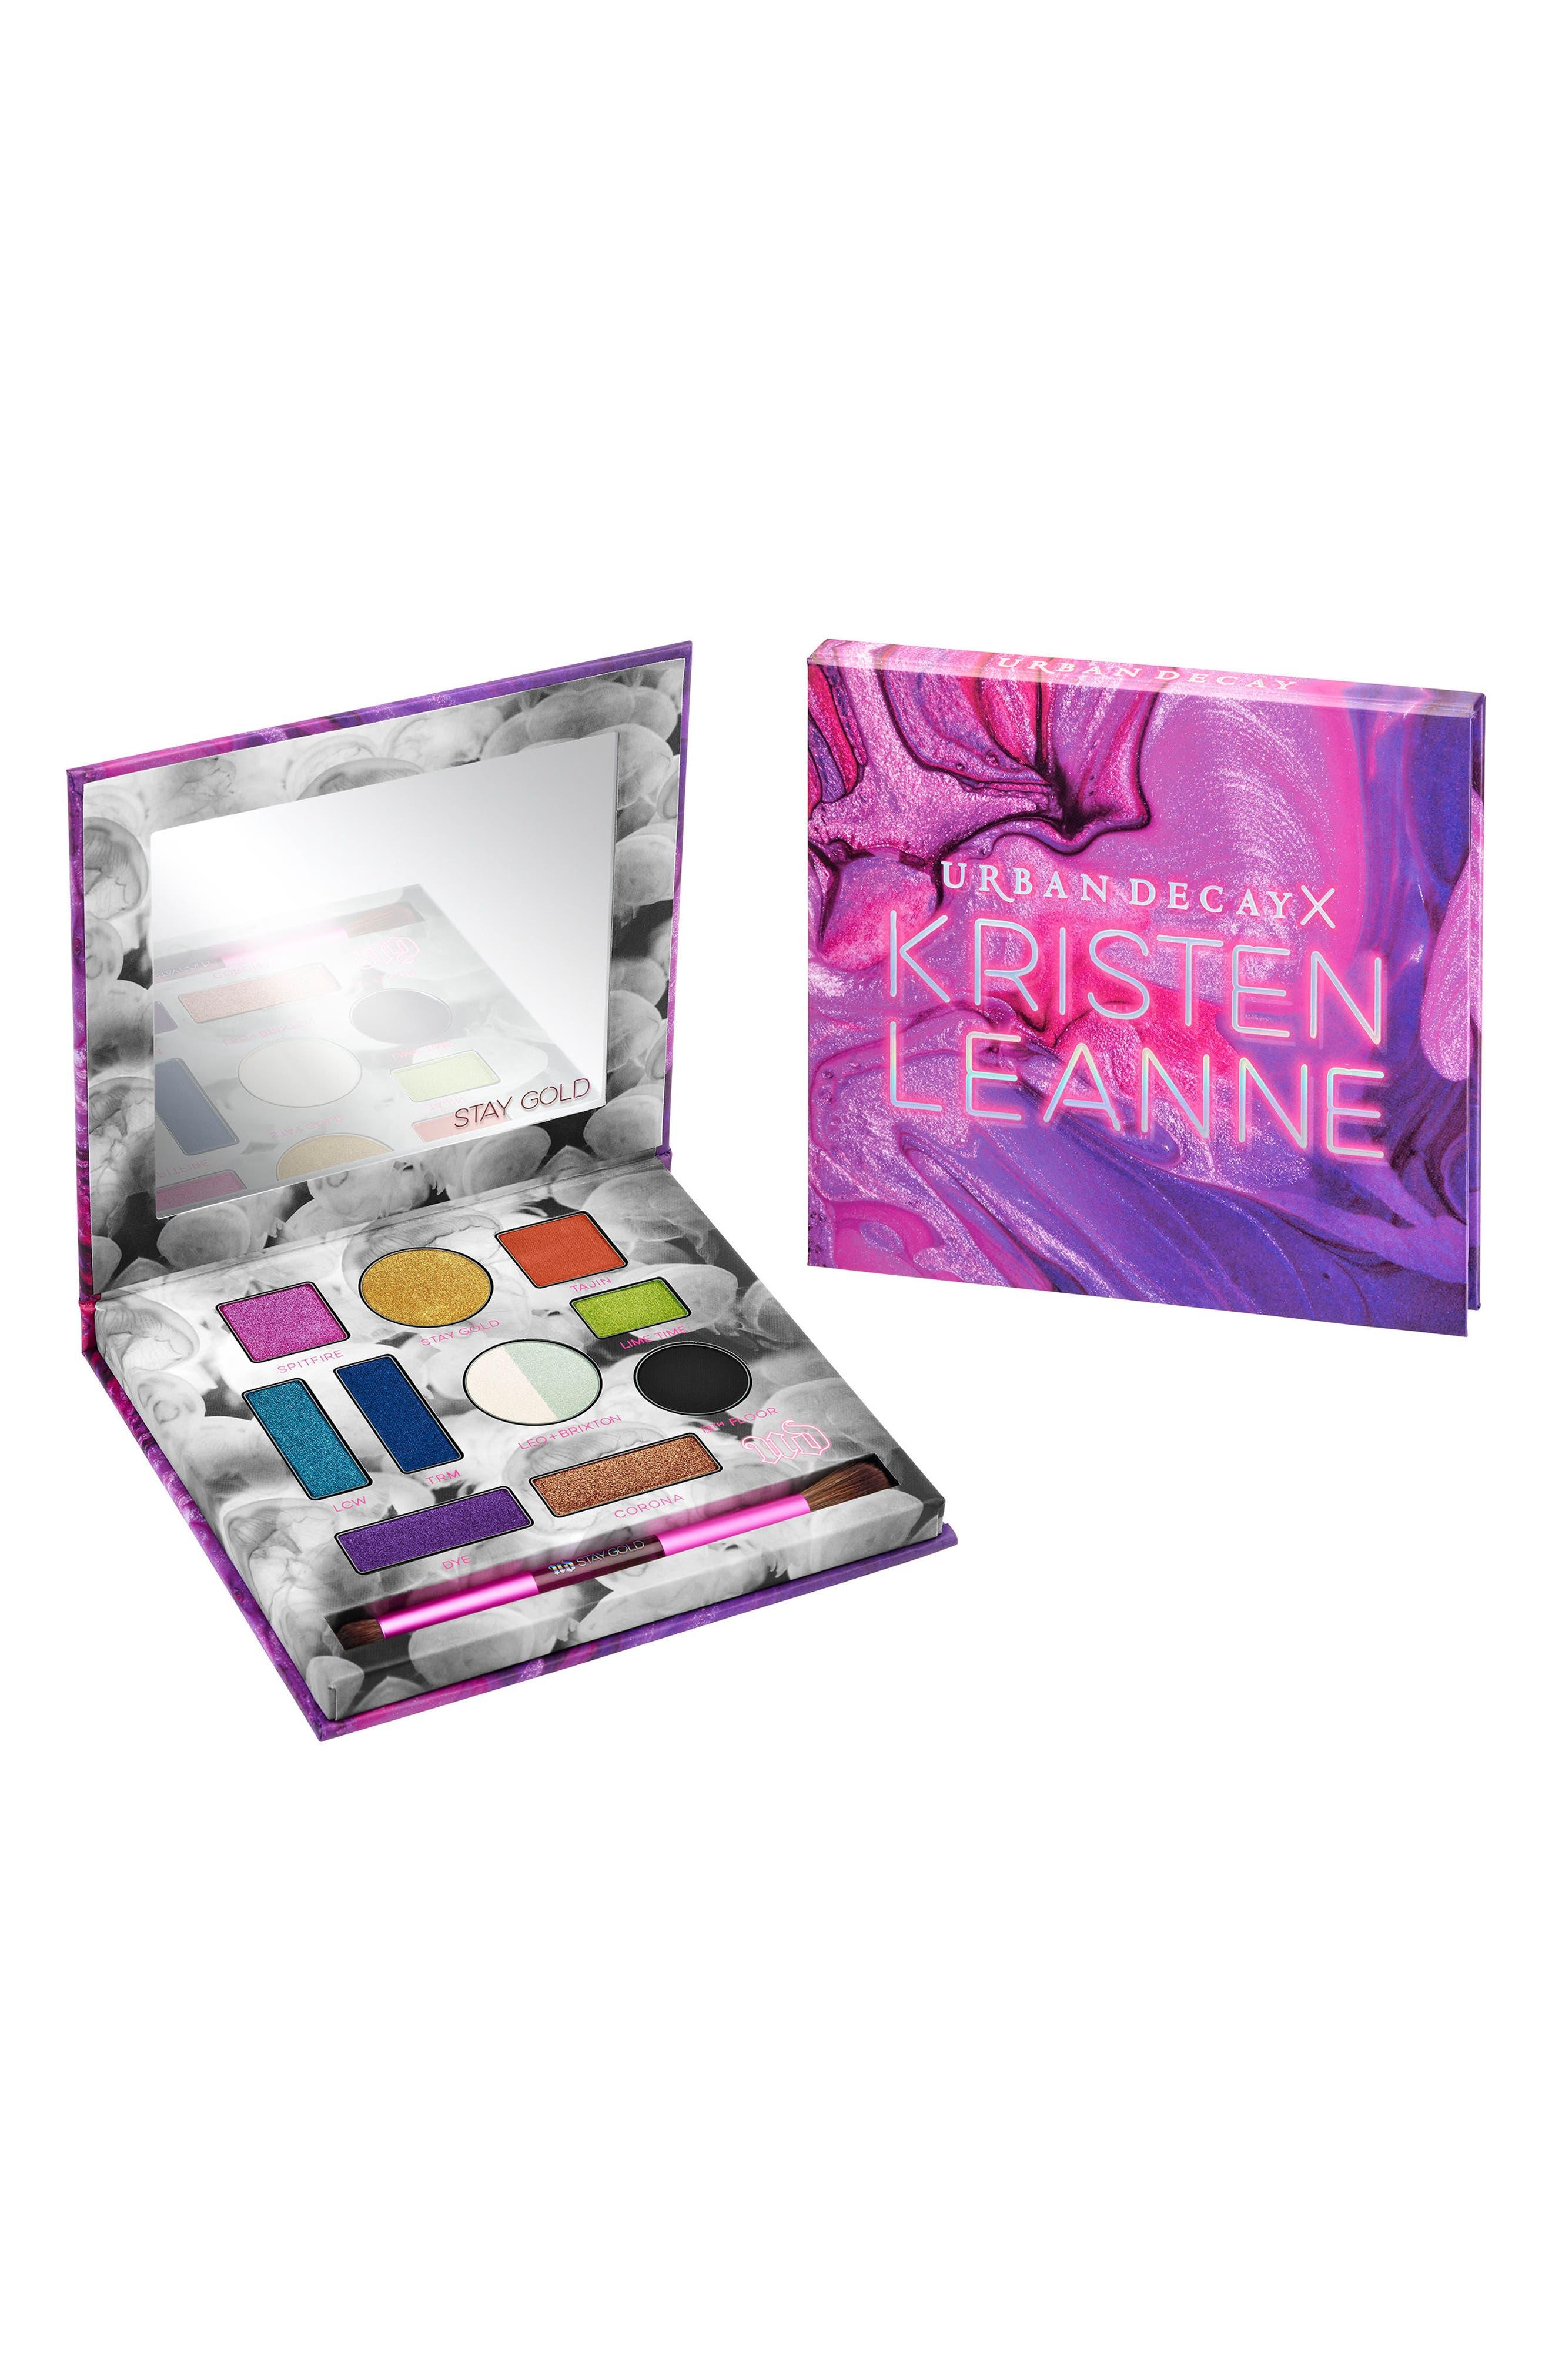 UD x Kristen Leanne Kaleidoscope Dream Eyeshadow Palette,                             Alternate thumbnail 7, color,                             960